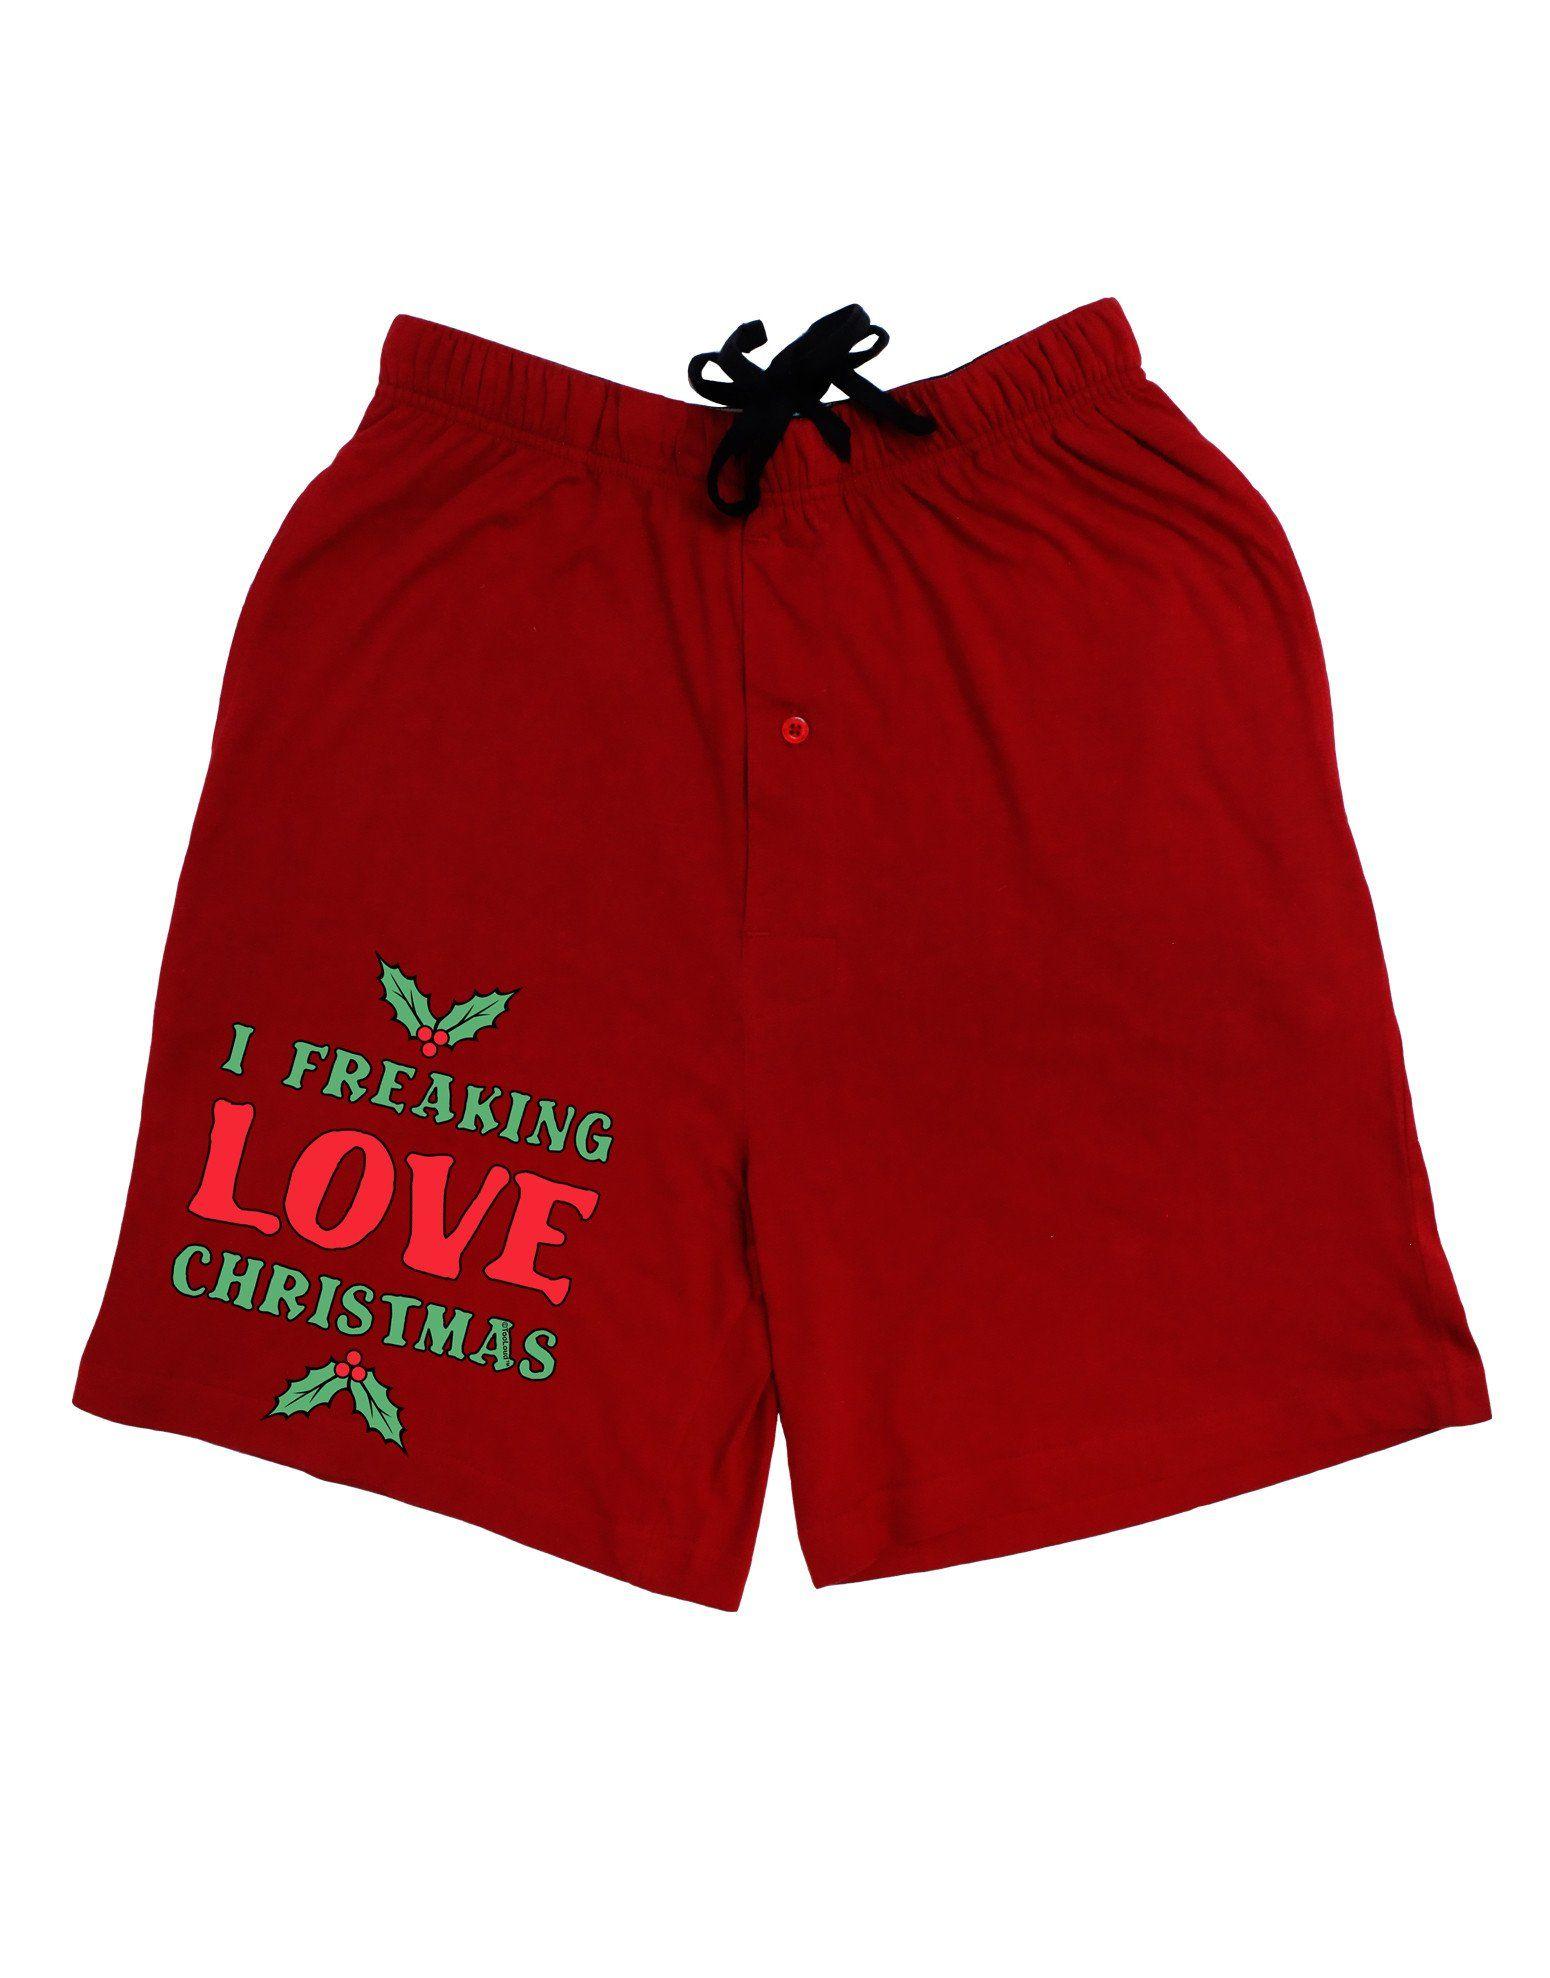 I Freaking Love Christmas Funny Adult Lounge Shorts - Red- Medium